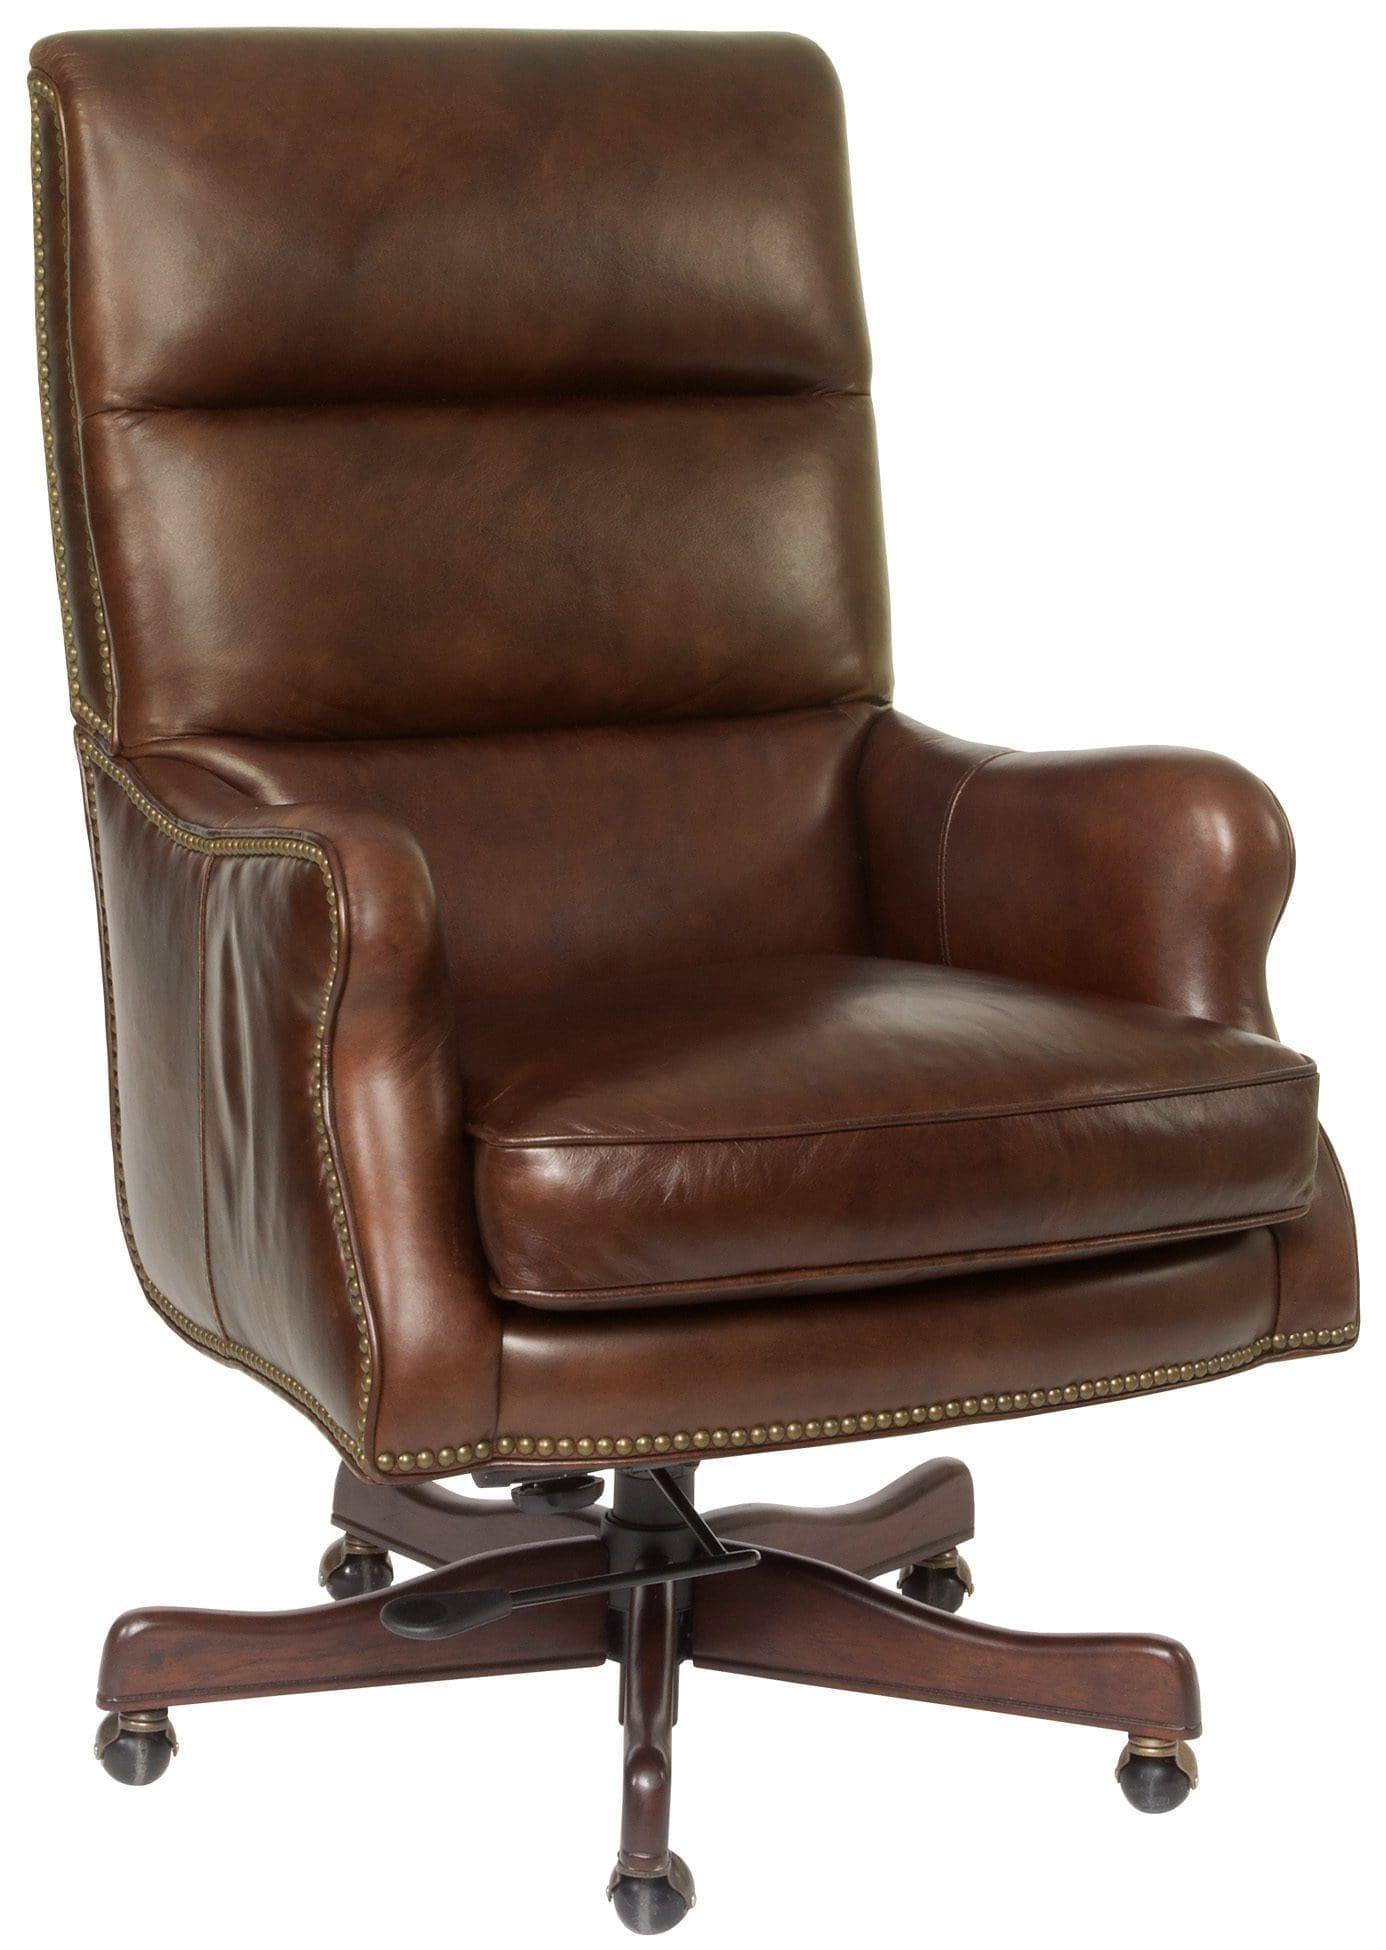 Victoria Executive Swivel Tilt Chair